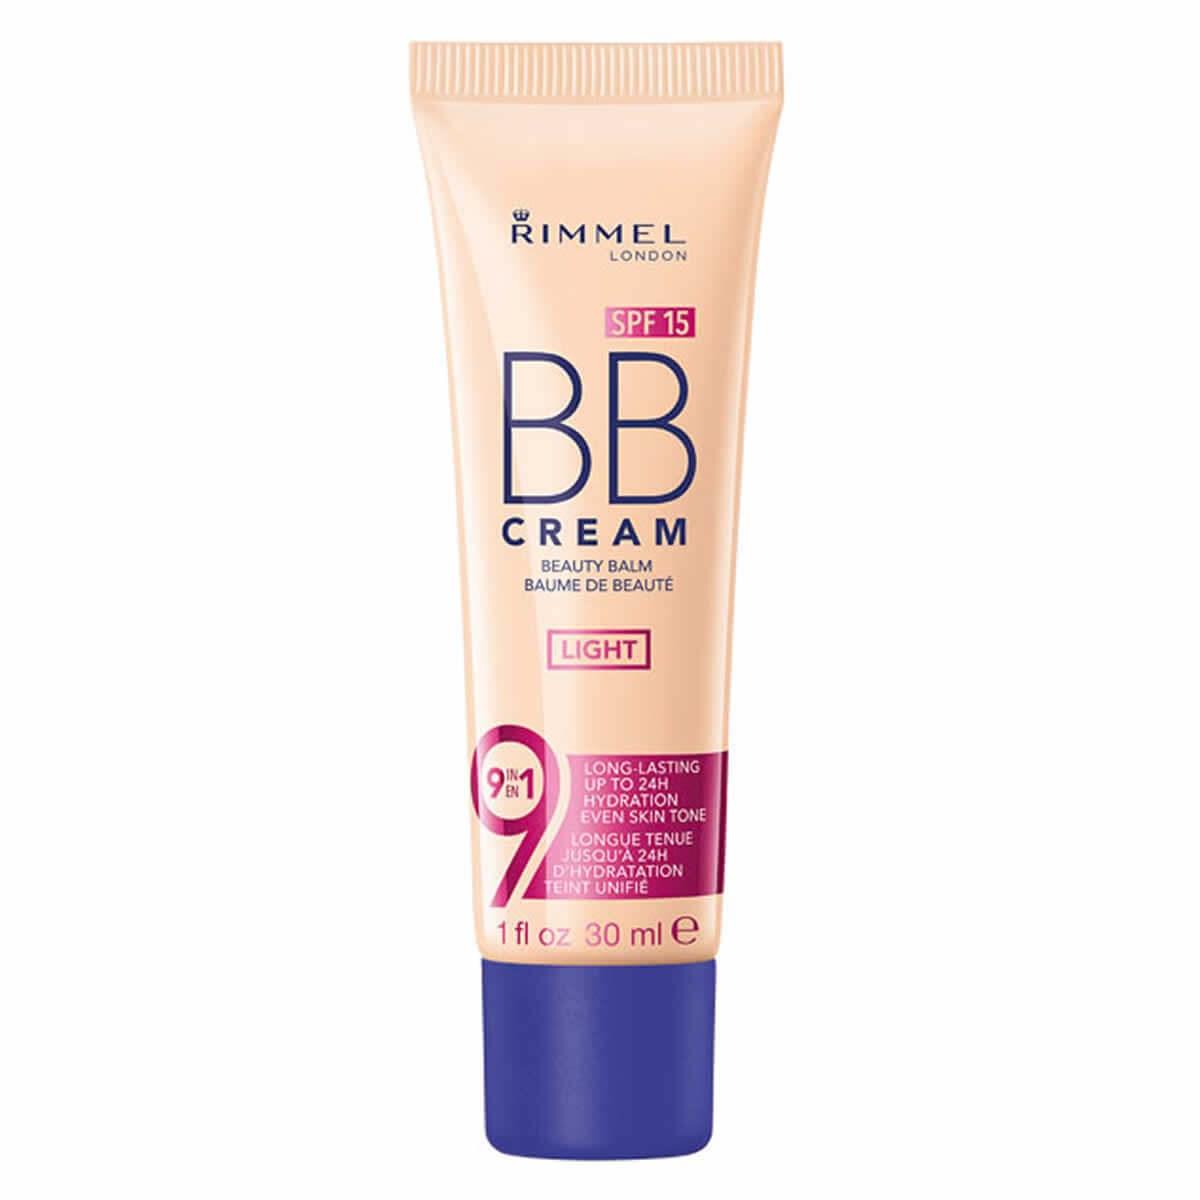 Rimmel BB Cream 9-in-1 Beauty Balm SPF15